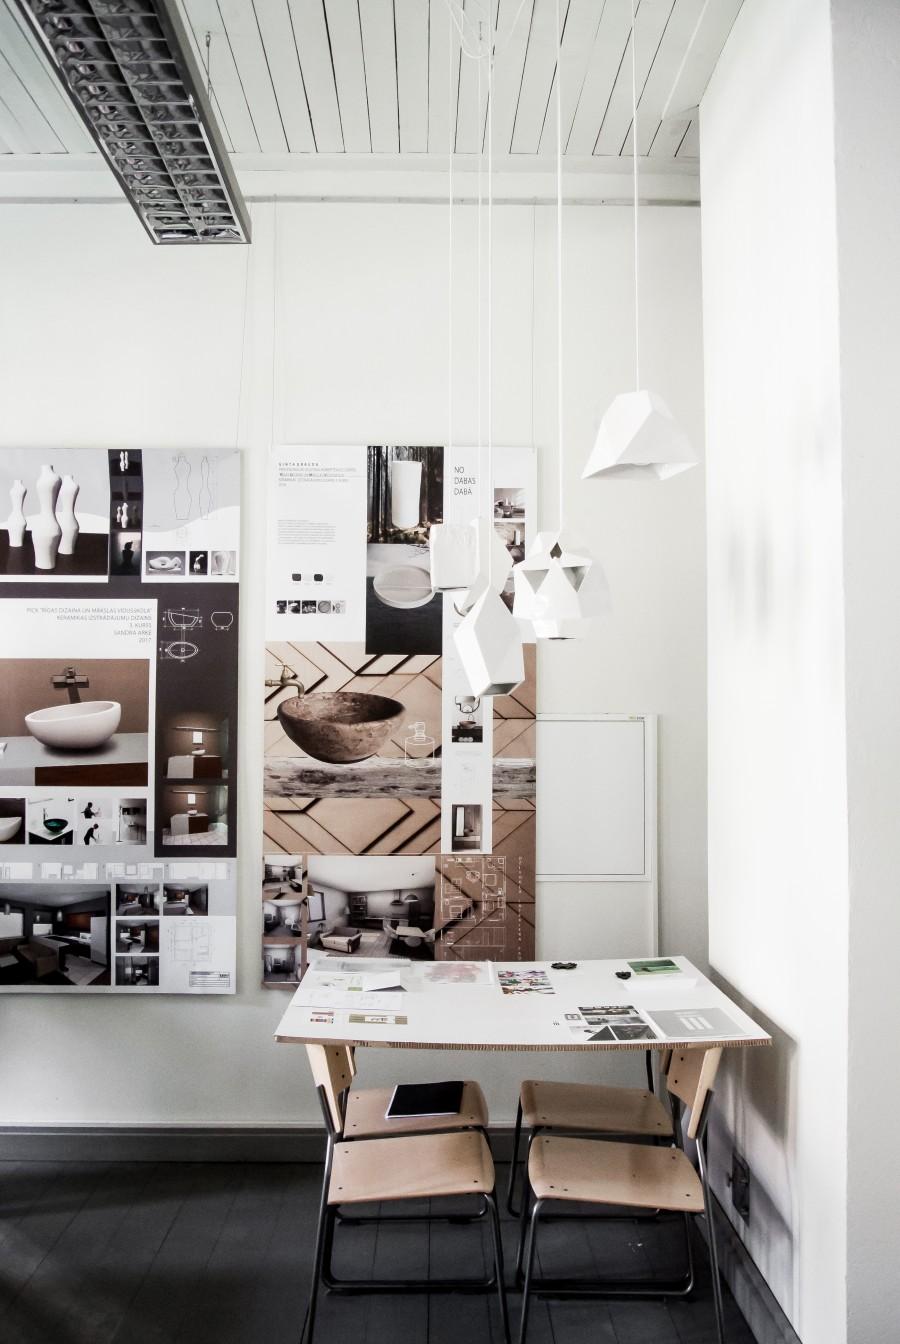 IKEA-ARTSCHOOL-100-e1499173731640.jpg